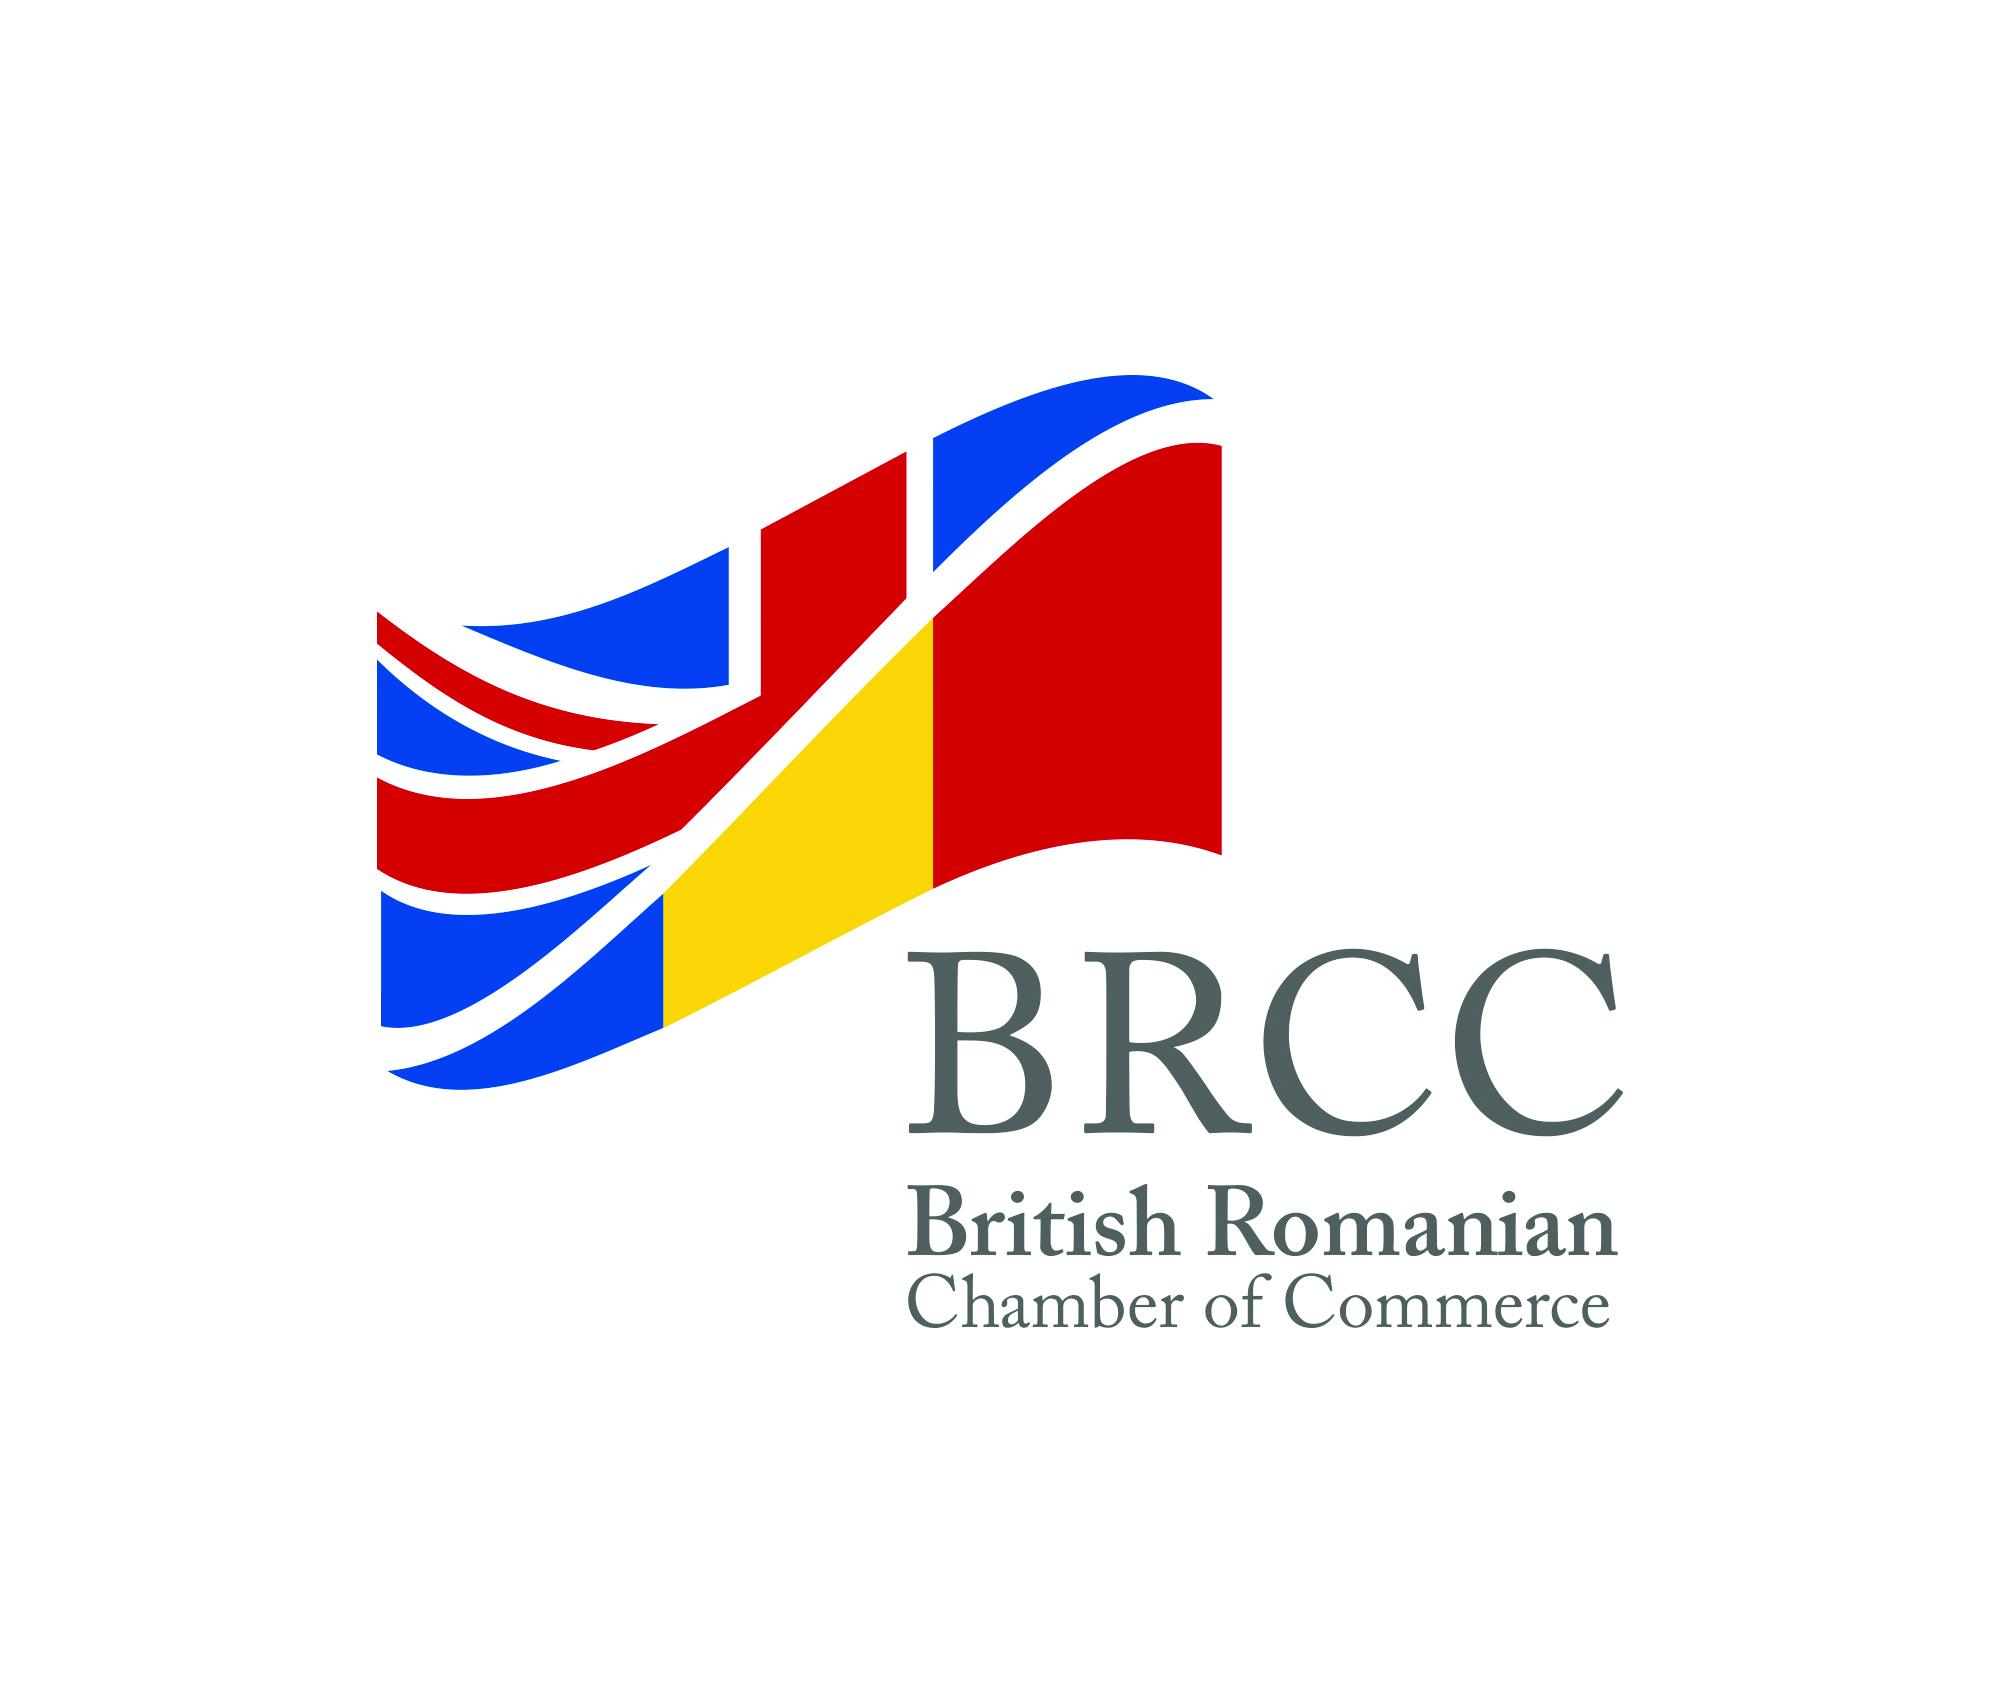 BRCC_logo_stacked_colour_safe_300dpi_cmyk.jpg